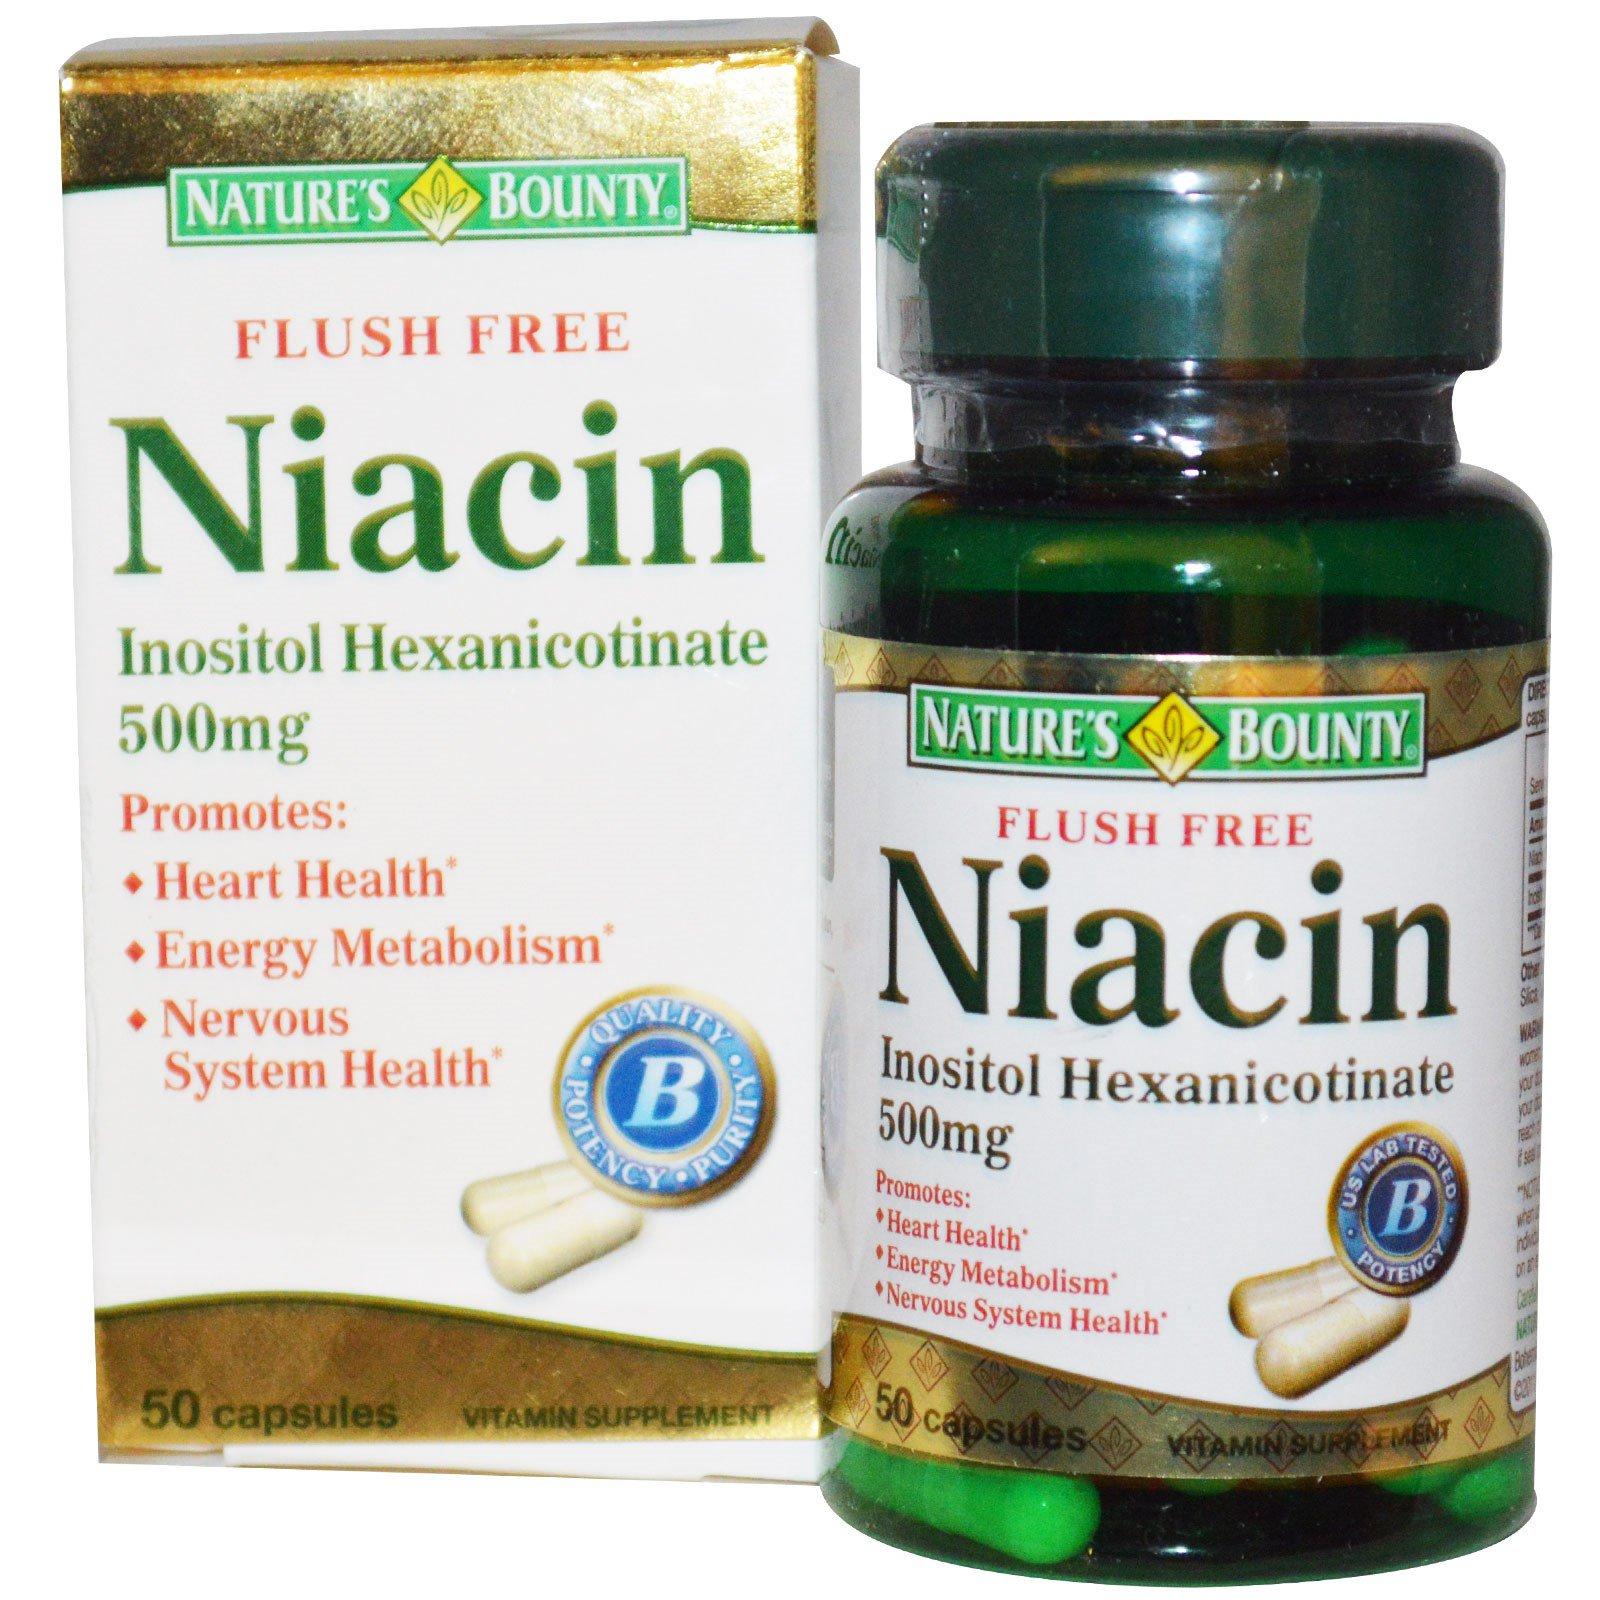 niacin drug test pass instructions